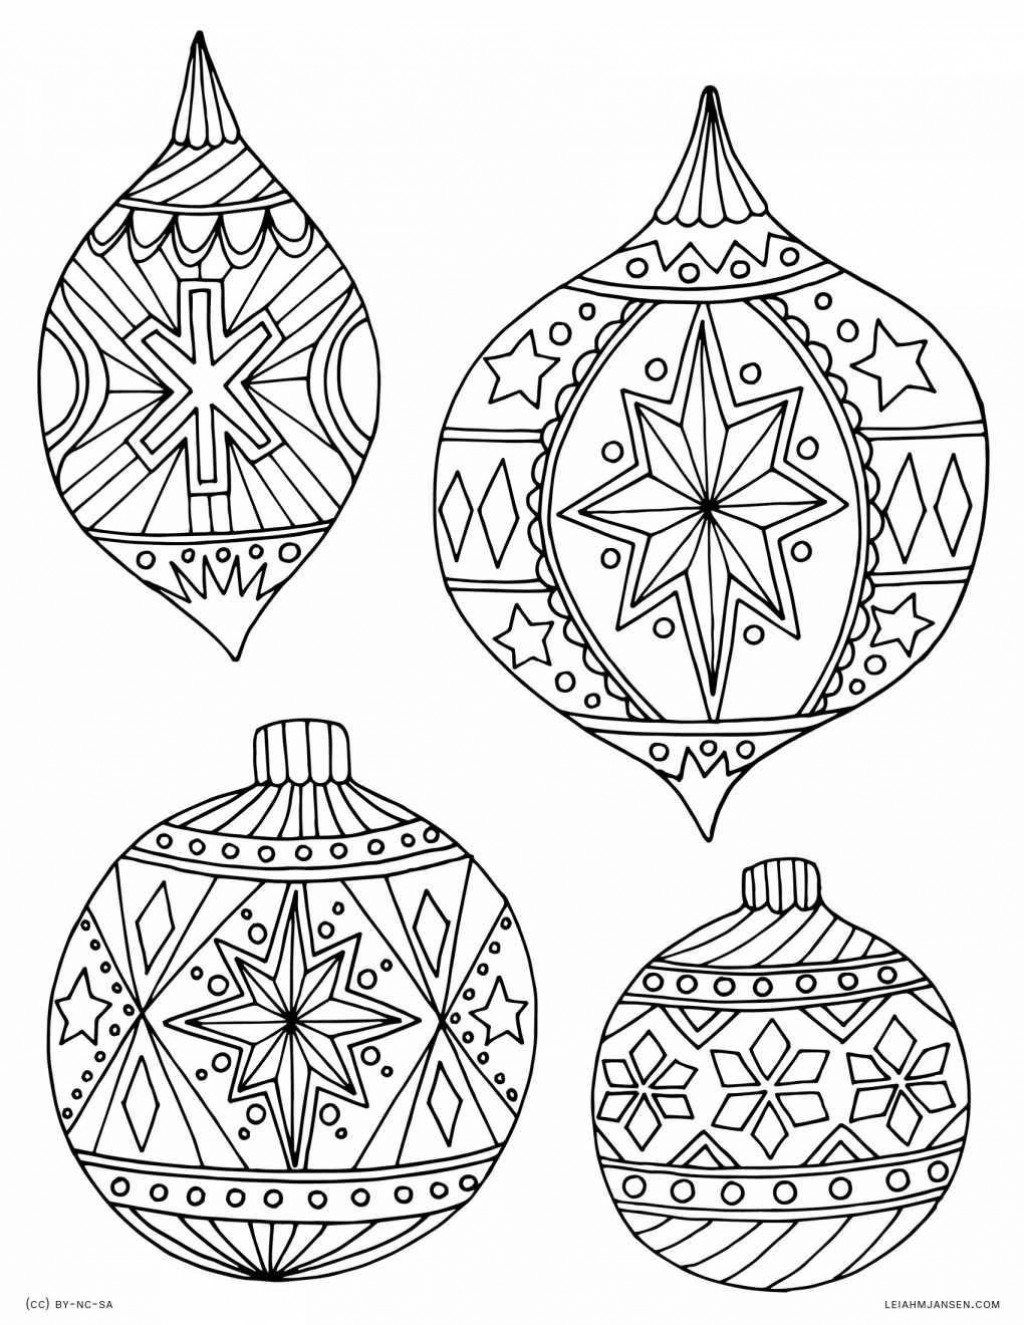 009 Stunning Printable Christma Ornament Template Sample  Templates Stencil Felt Pattern TreeLarge